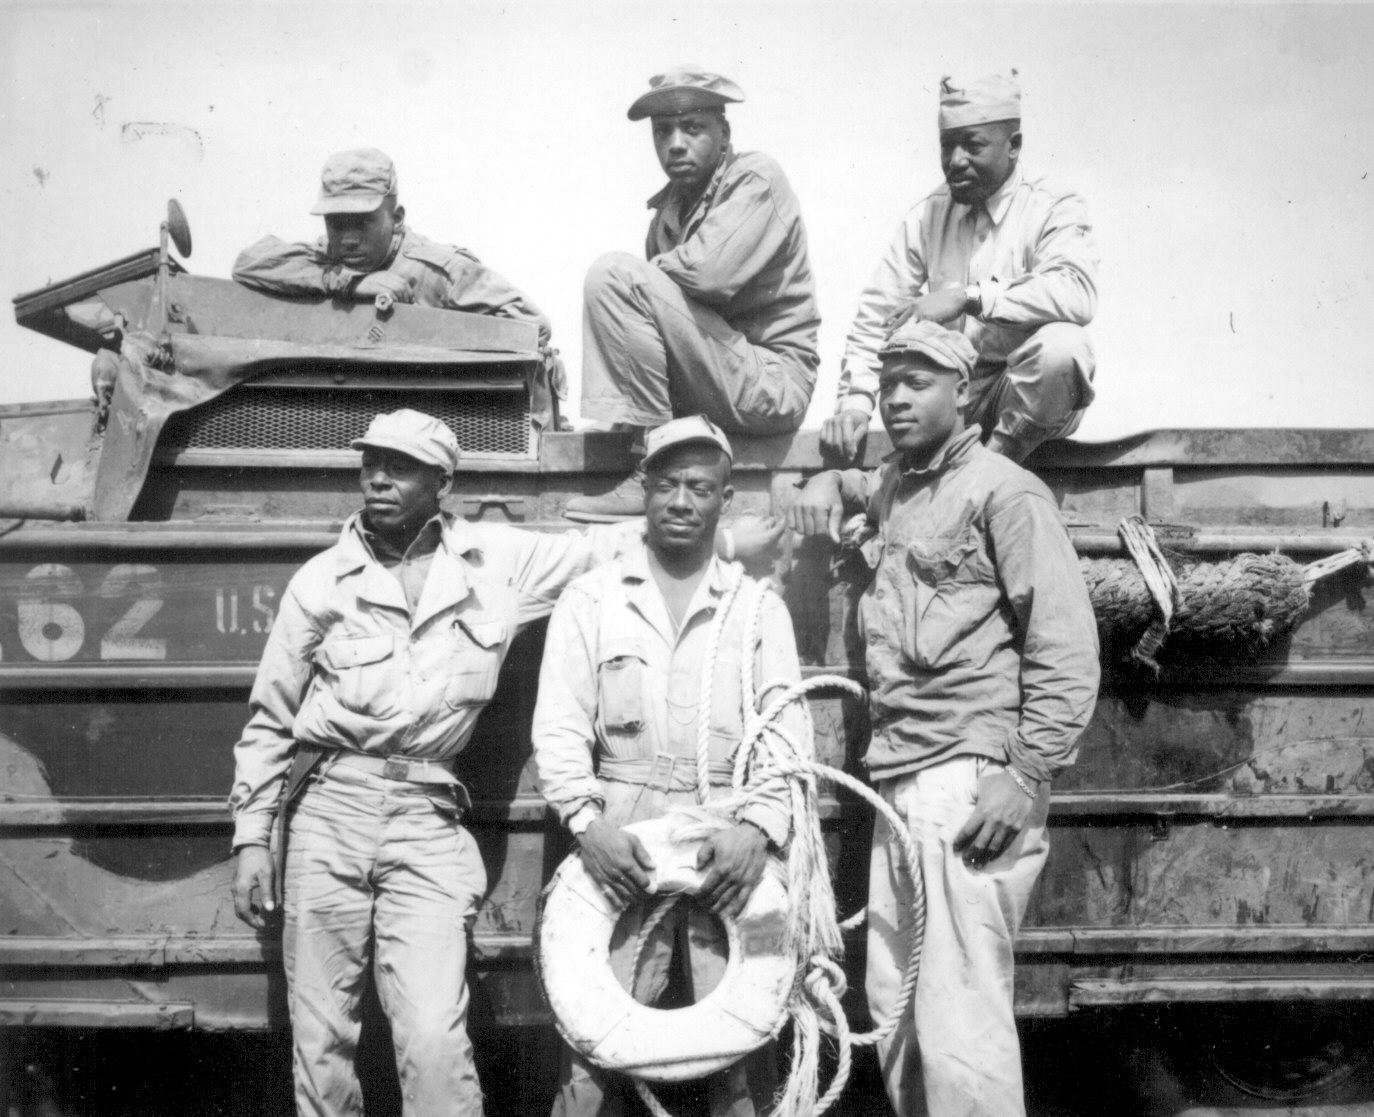 29 Vintage Photos of Child Soldiers in World War II